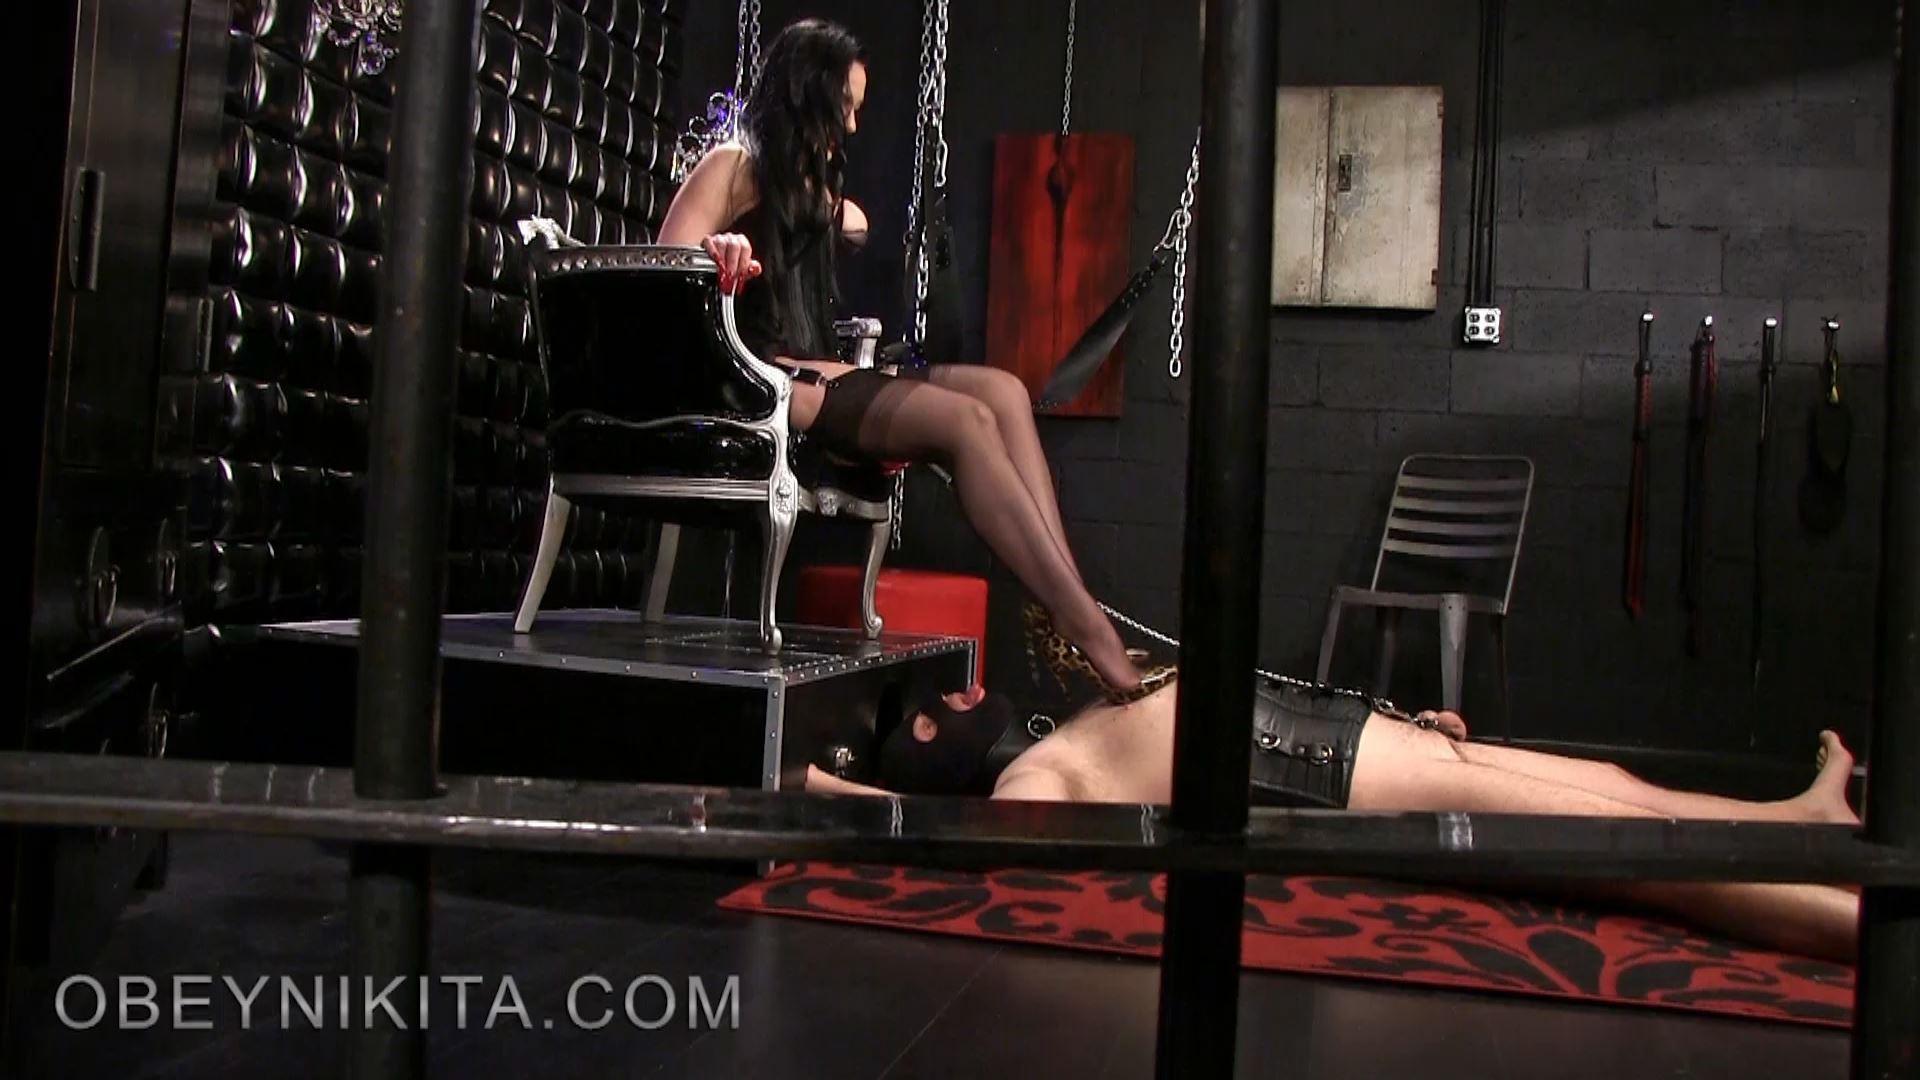 Mistress Nikita In Scene: Vfmc: Under Sole - OBEYNIKITA - FULL HD/1080p/MP4